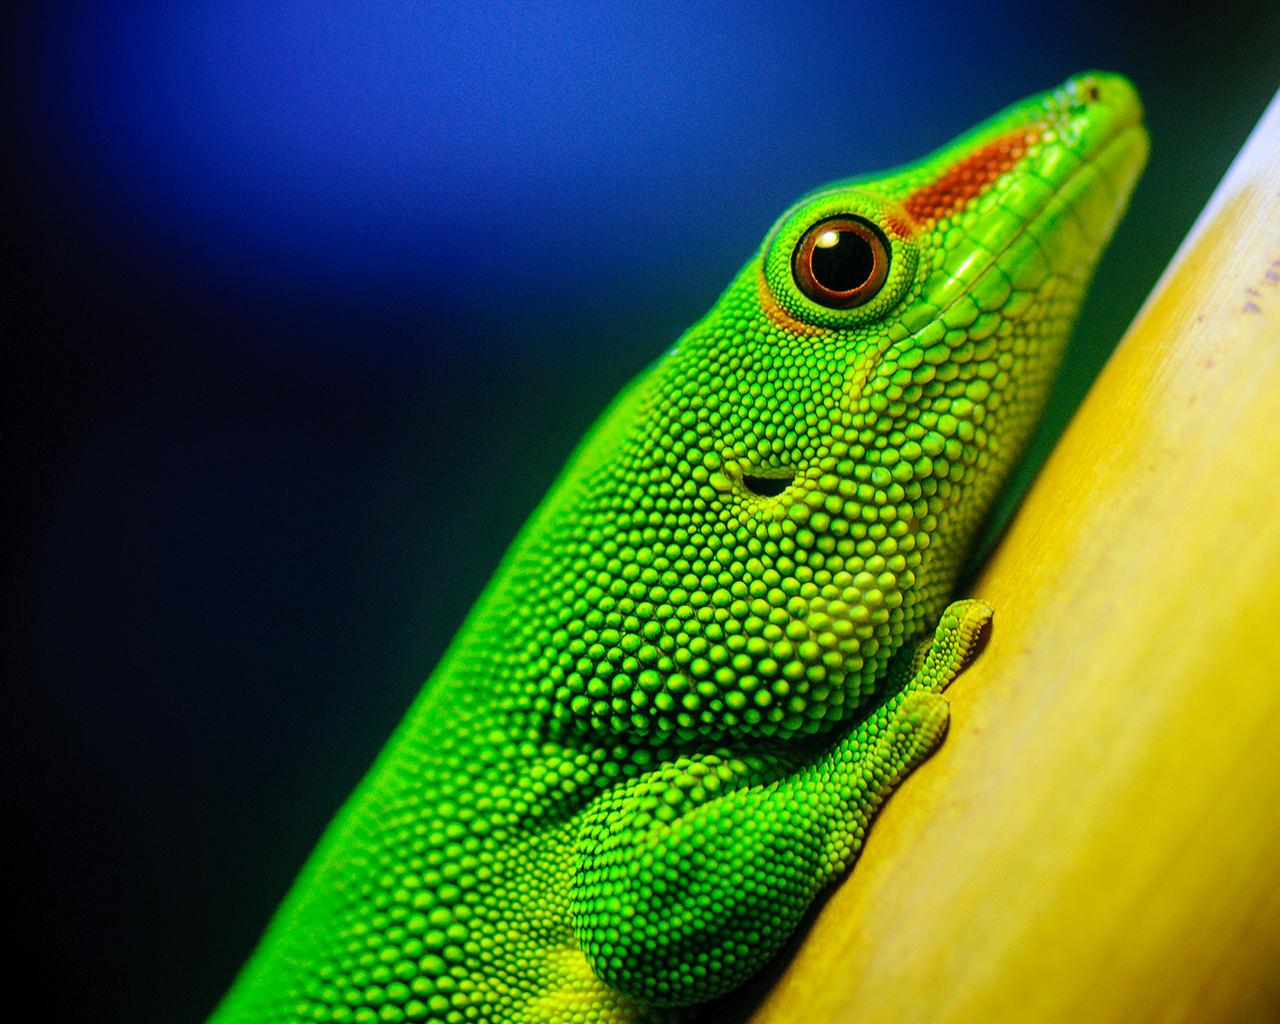 HQ Wallpapers Arena: Dangerous Green Lizard Wallpaper